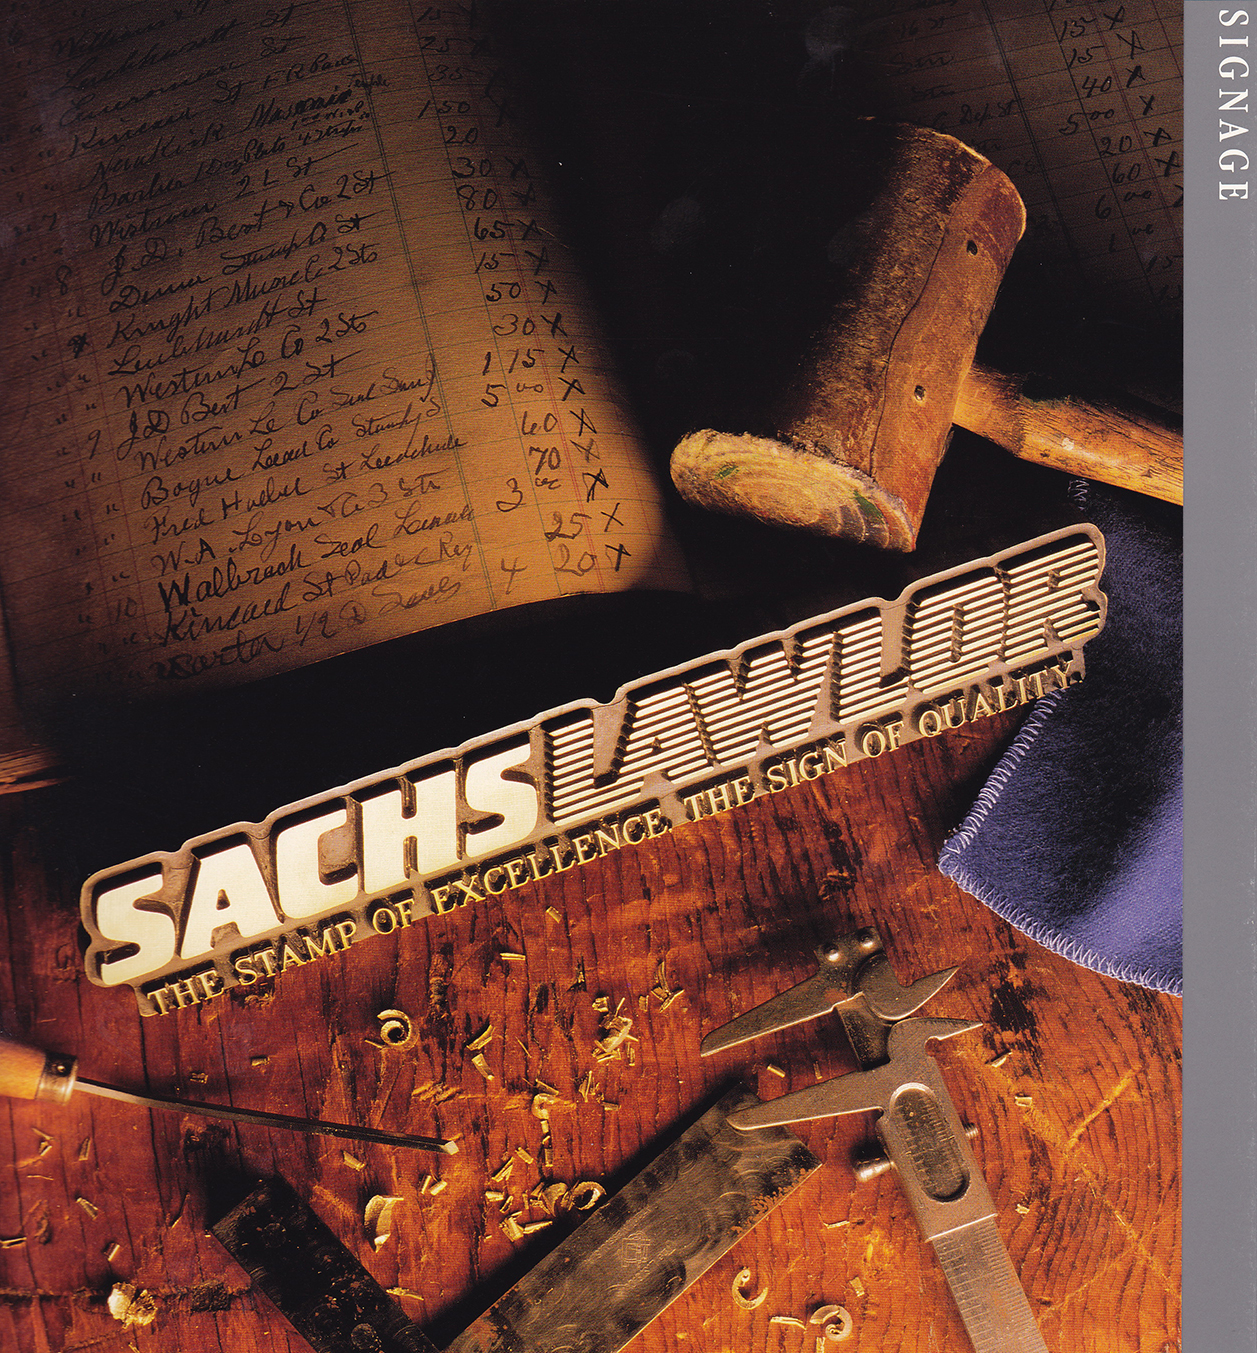 SachsLawlorweb.jpg